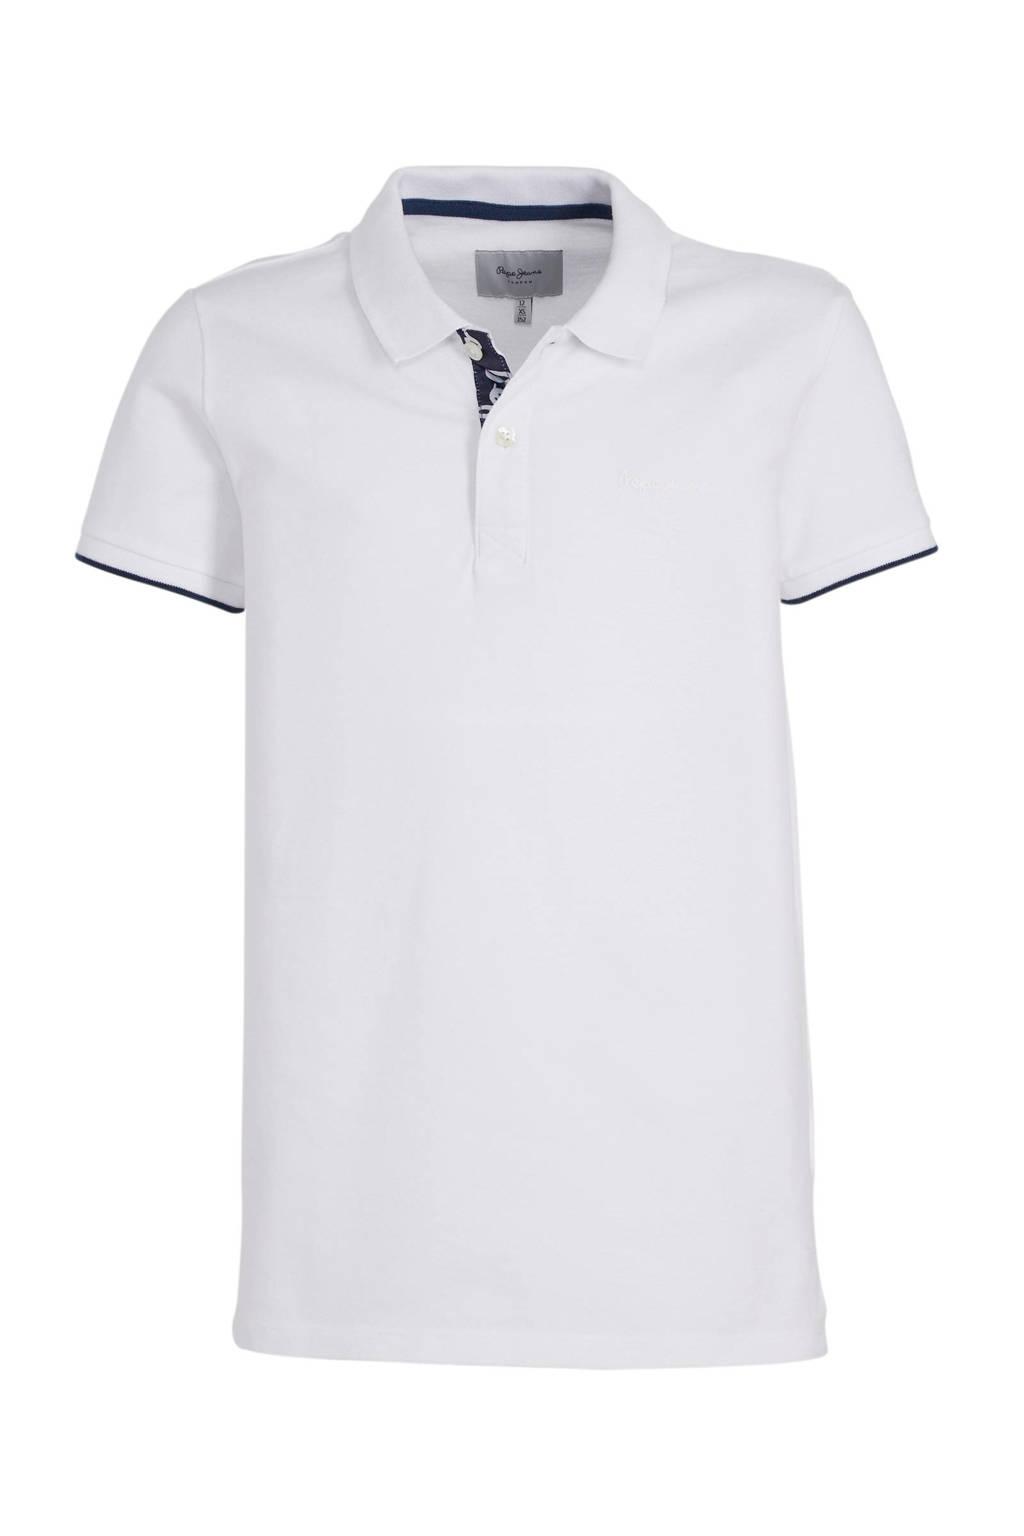 Pepe Jeans polo Thor JR met logo en borduursels wit, Wit